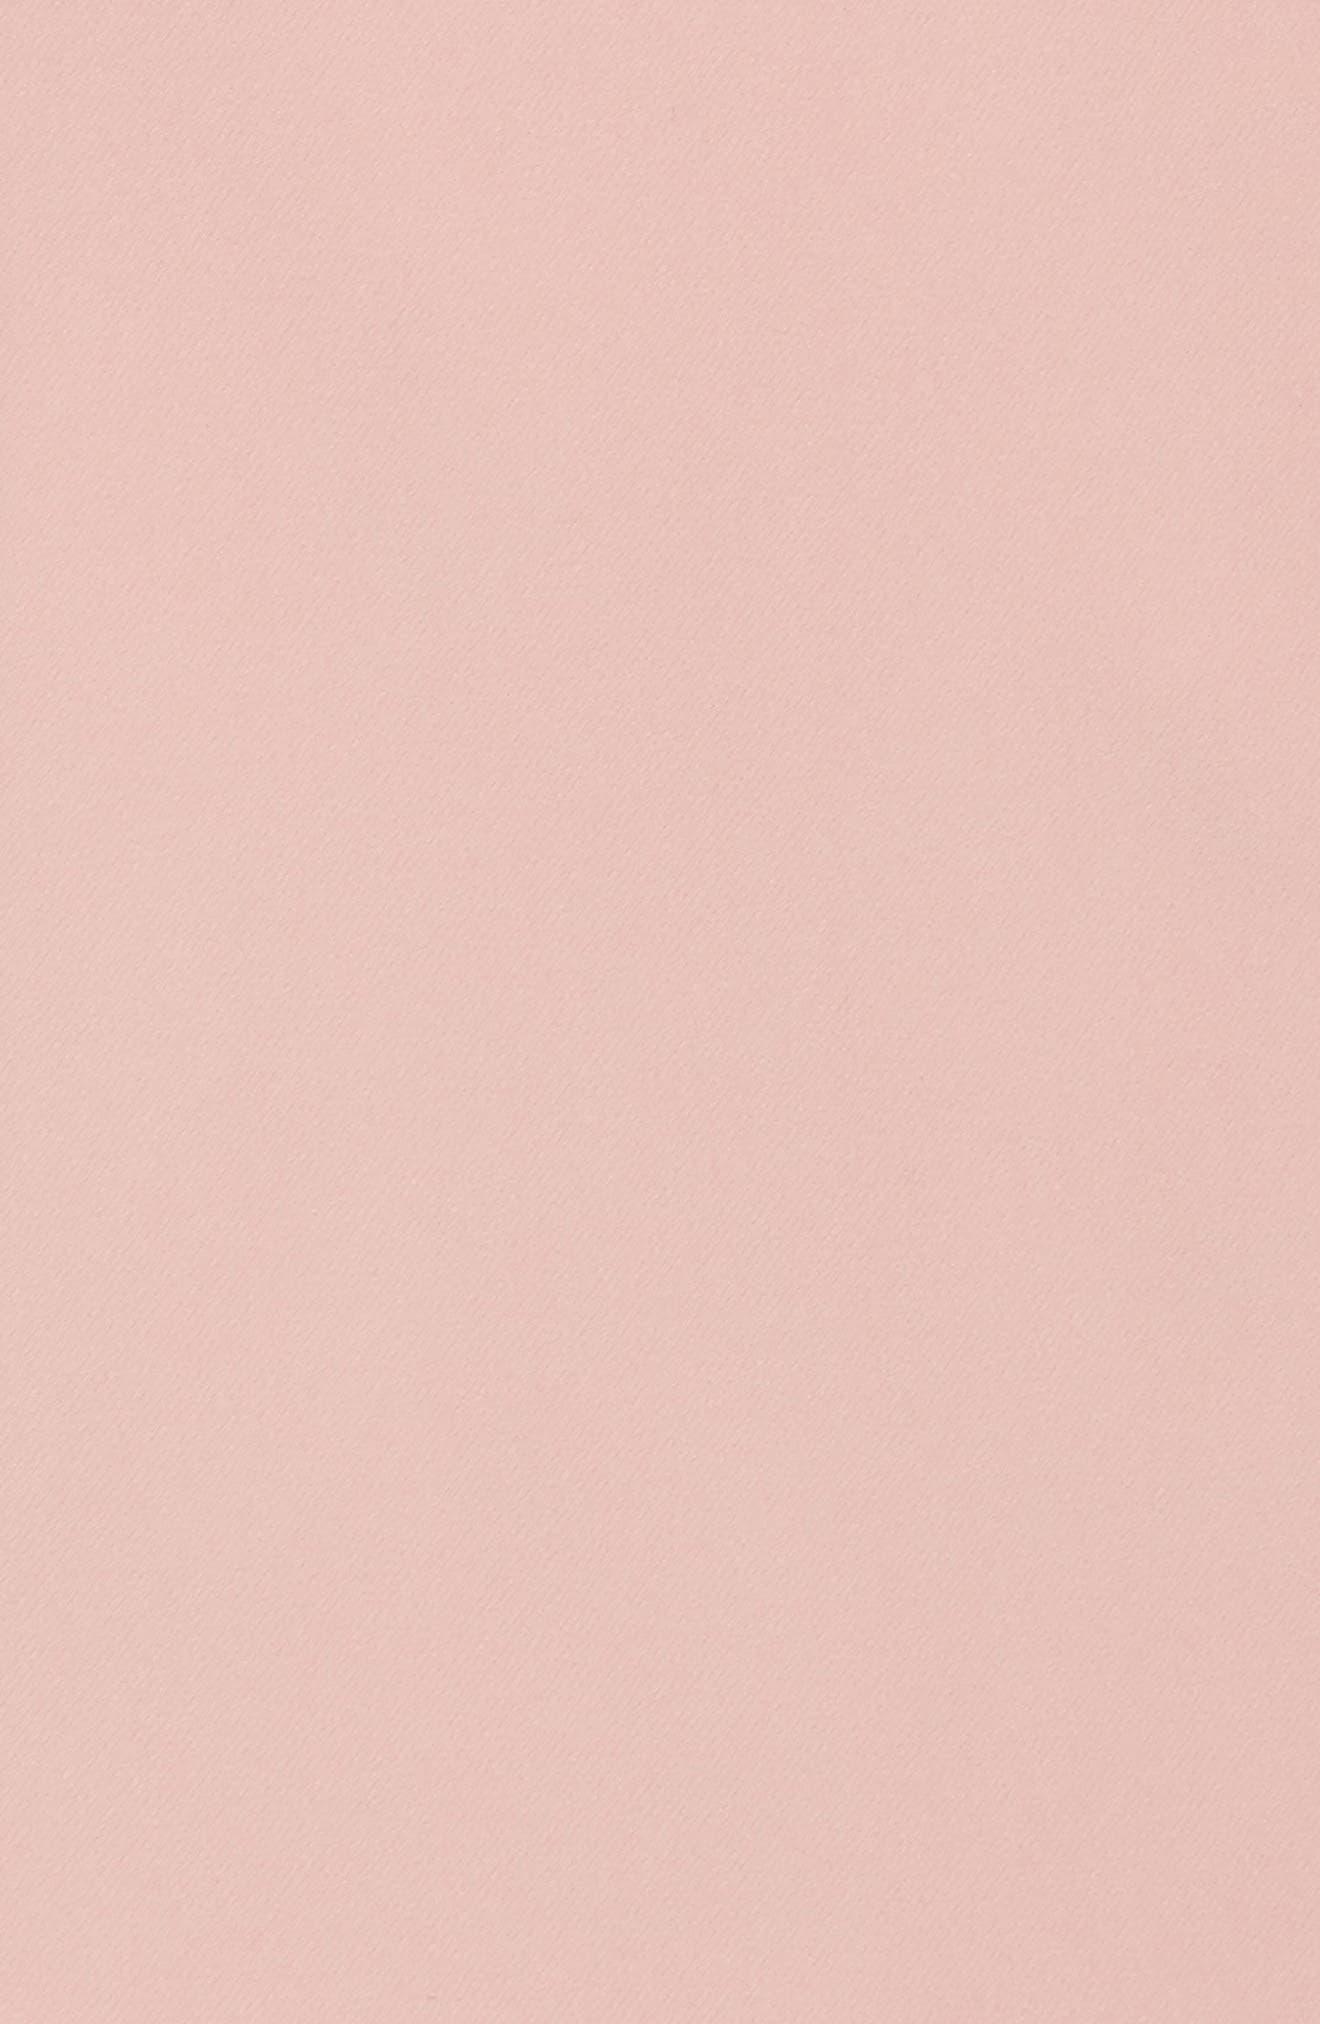 One-Shoulder Ruffle Sheath Dress,                             Alternate thumbnail 5, color,                             Pastel